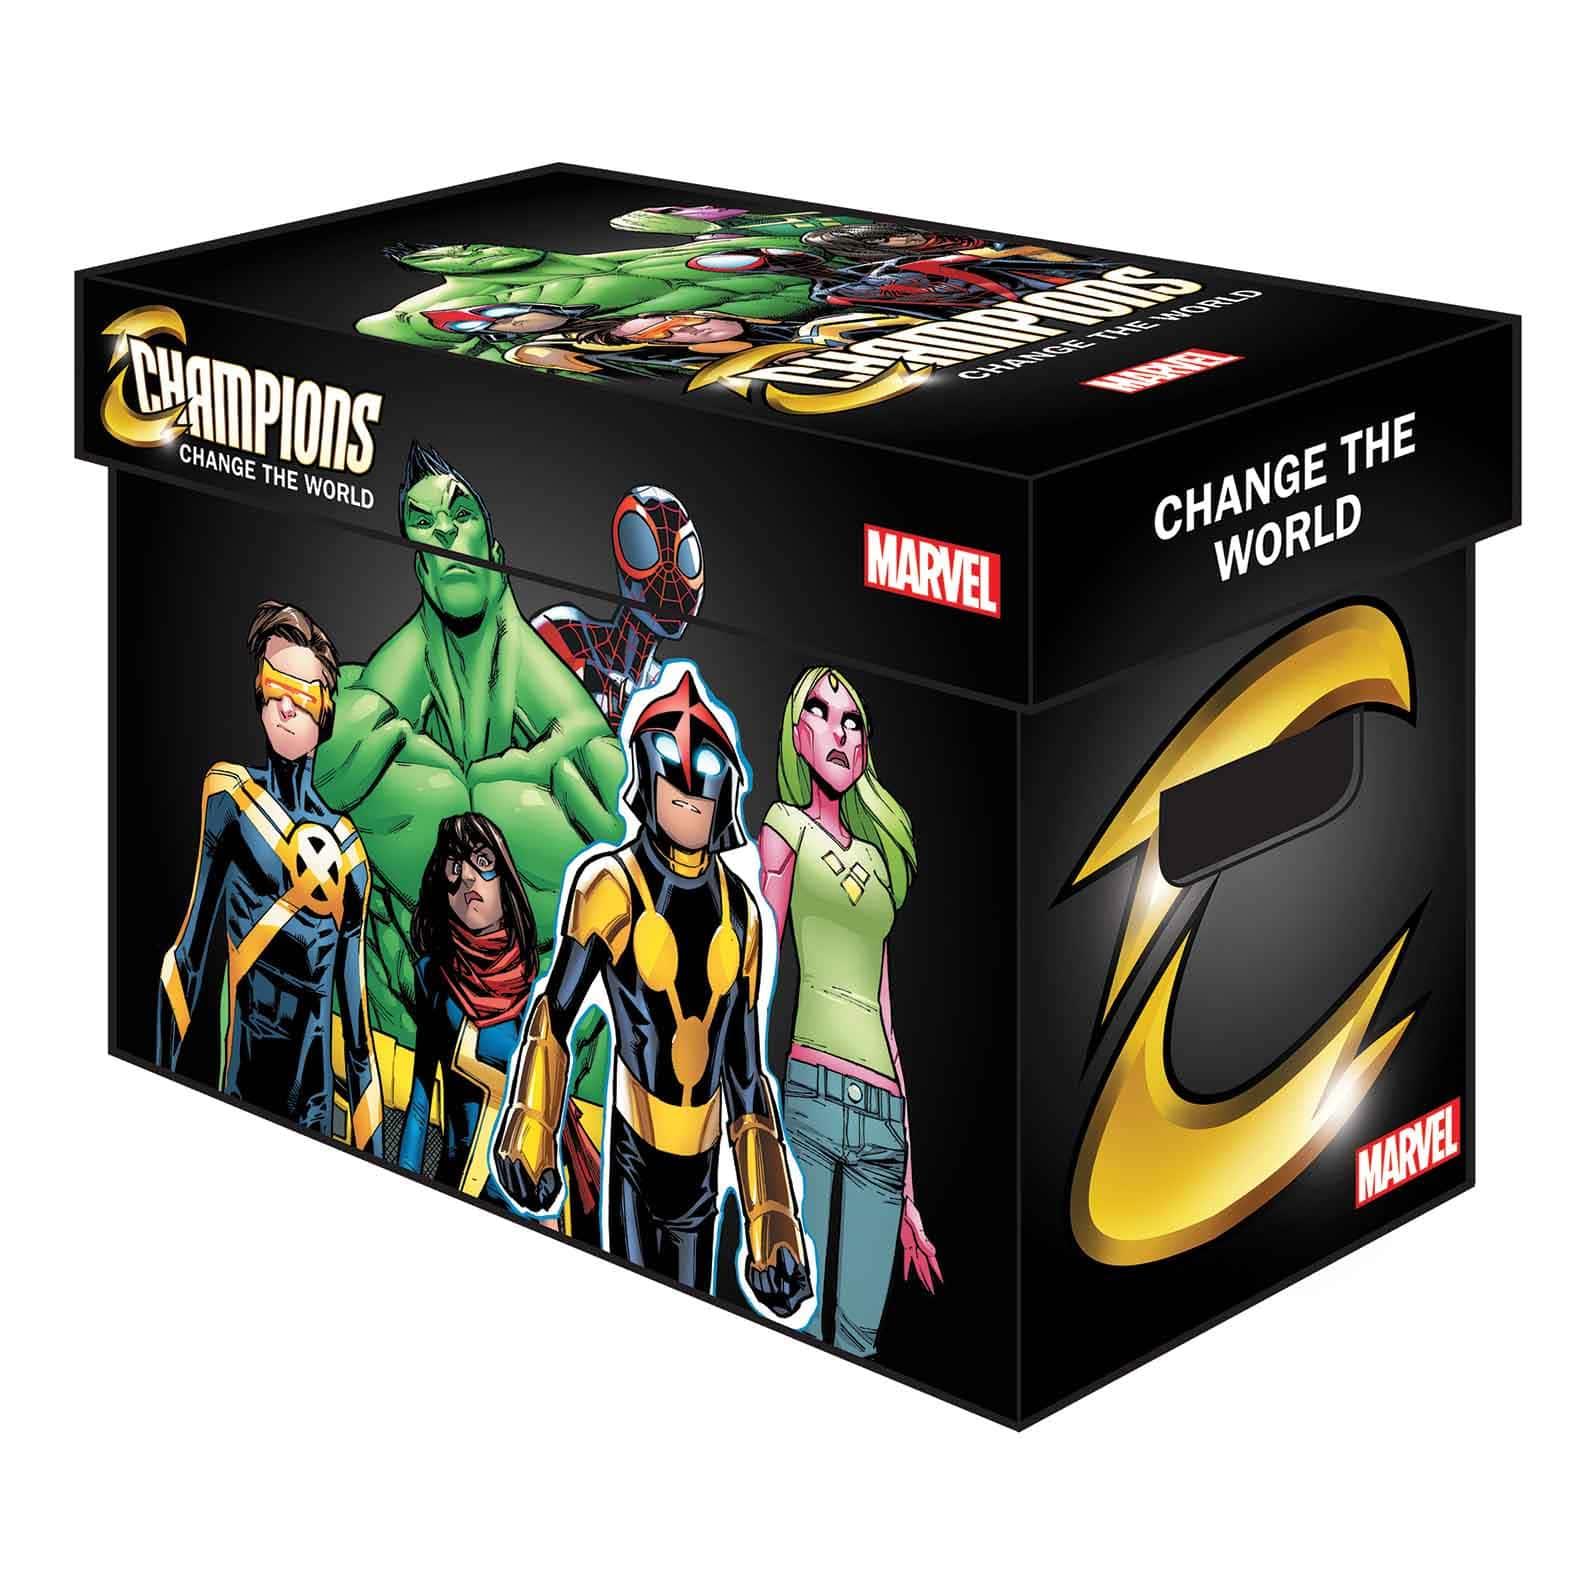 marvel_graphic_comic_box_championsmarvel_graphic_comic_box_champions